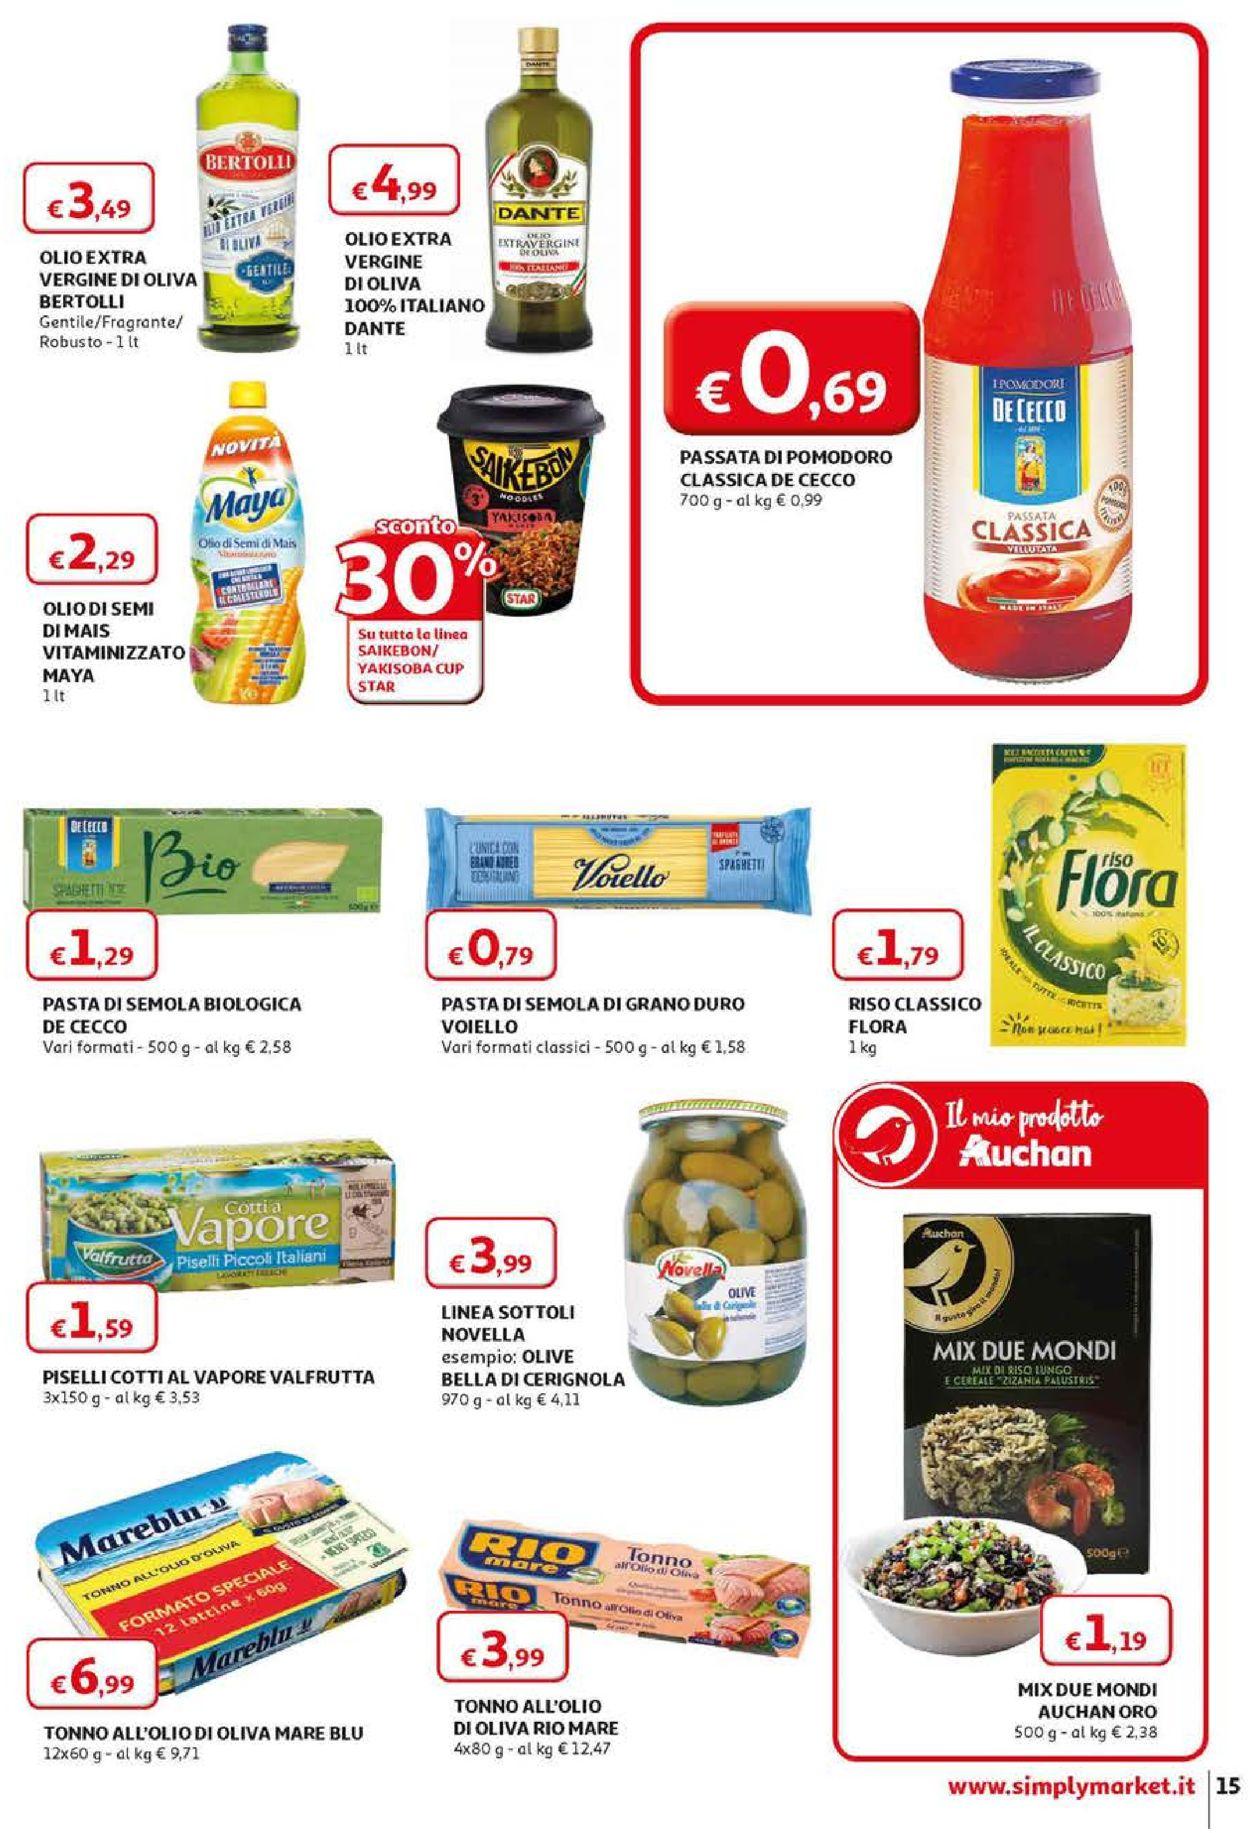 Volantino Simply Market - Offerte 12/04-22/04/2020 (Pagina 15)